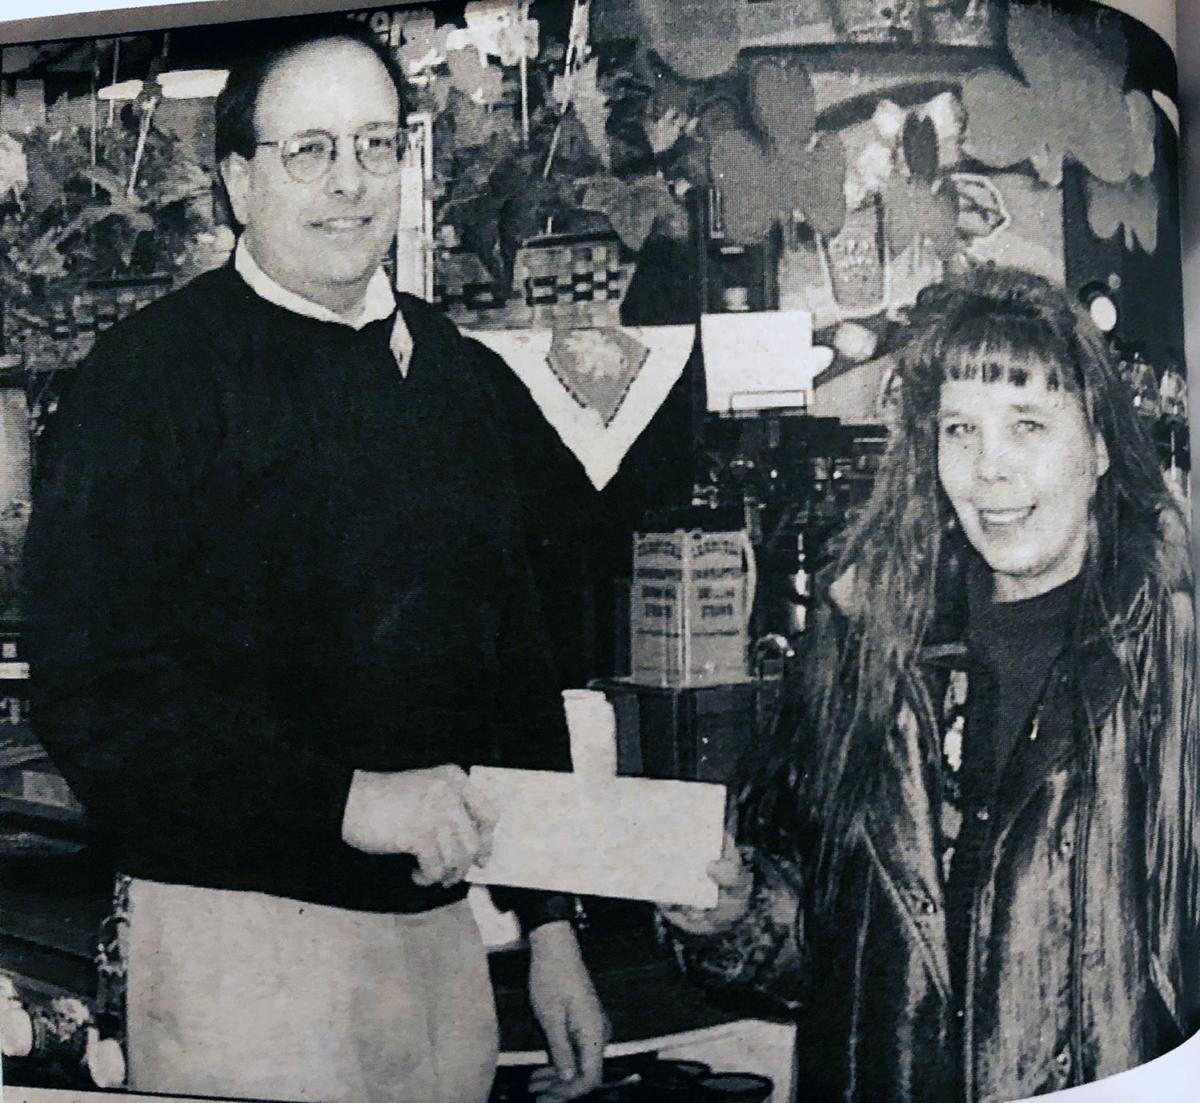 2001 Kwik Trip manager Jeff Blease and Jennifer Harman of Restoration Group.